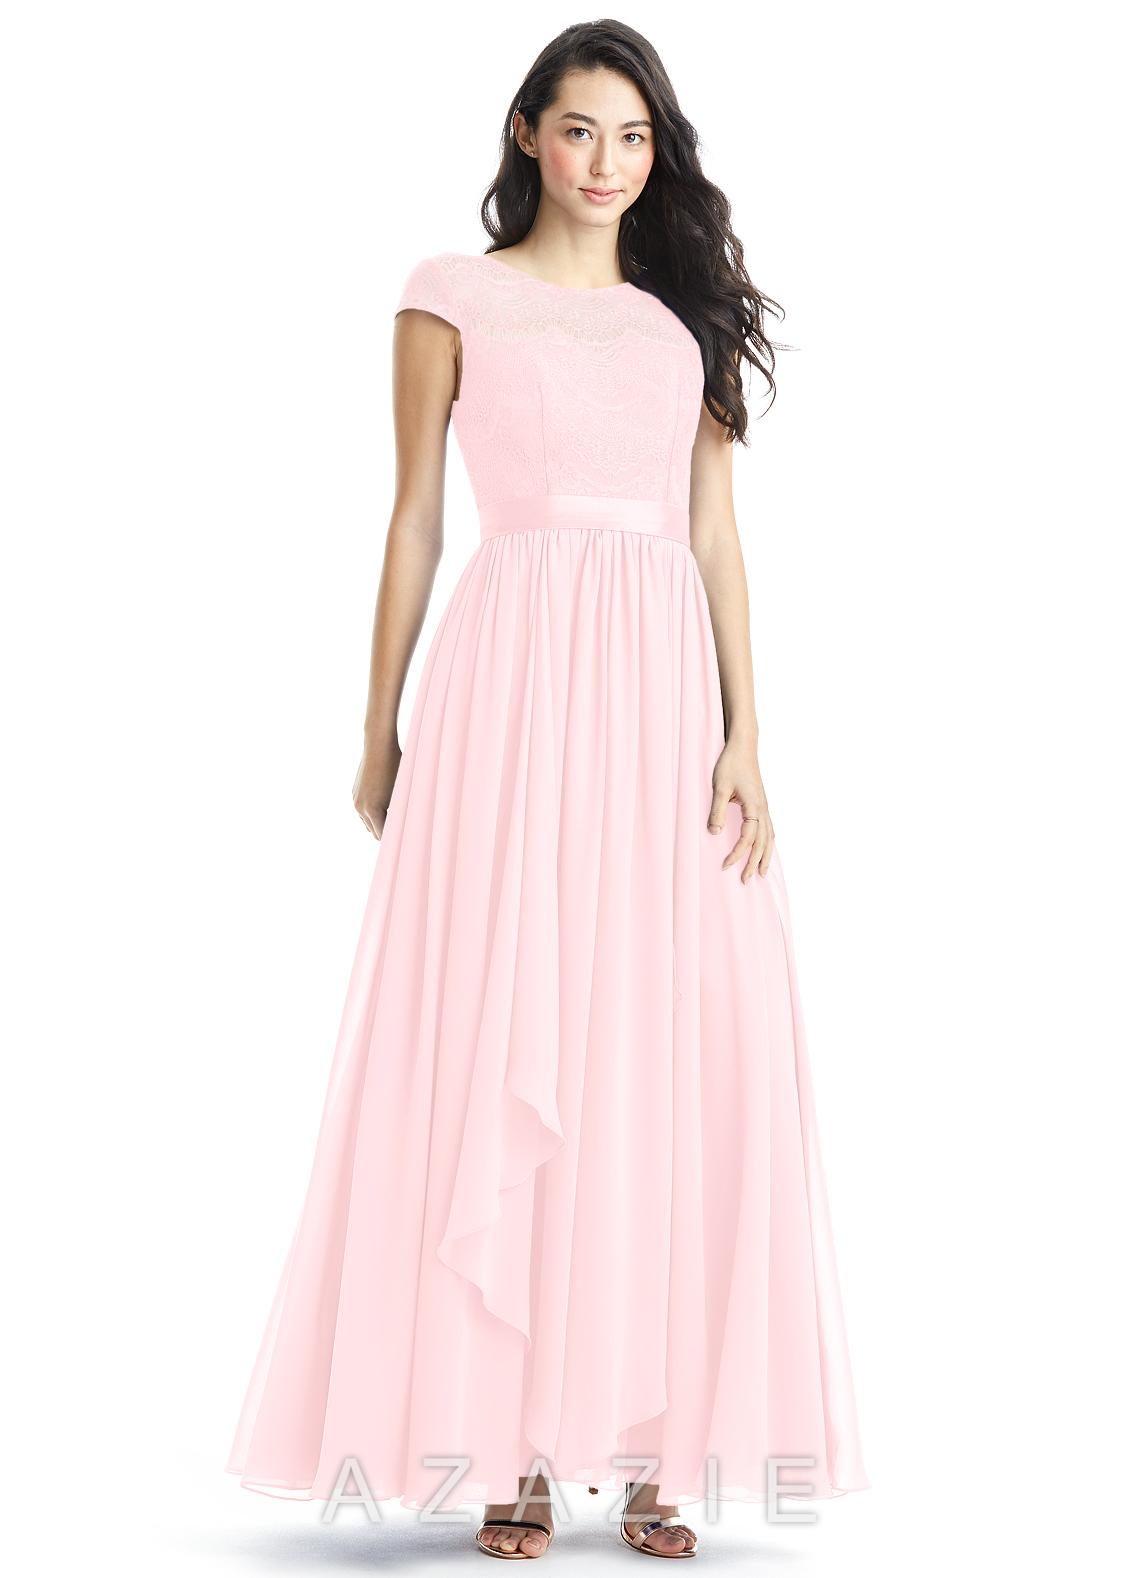 Azazie Beatrice Bridesmaid Dress | Azazie - photo #13